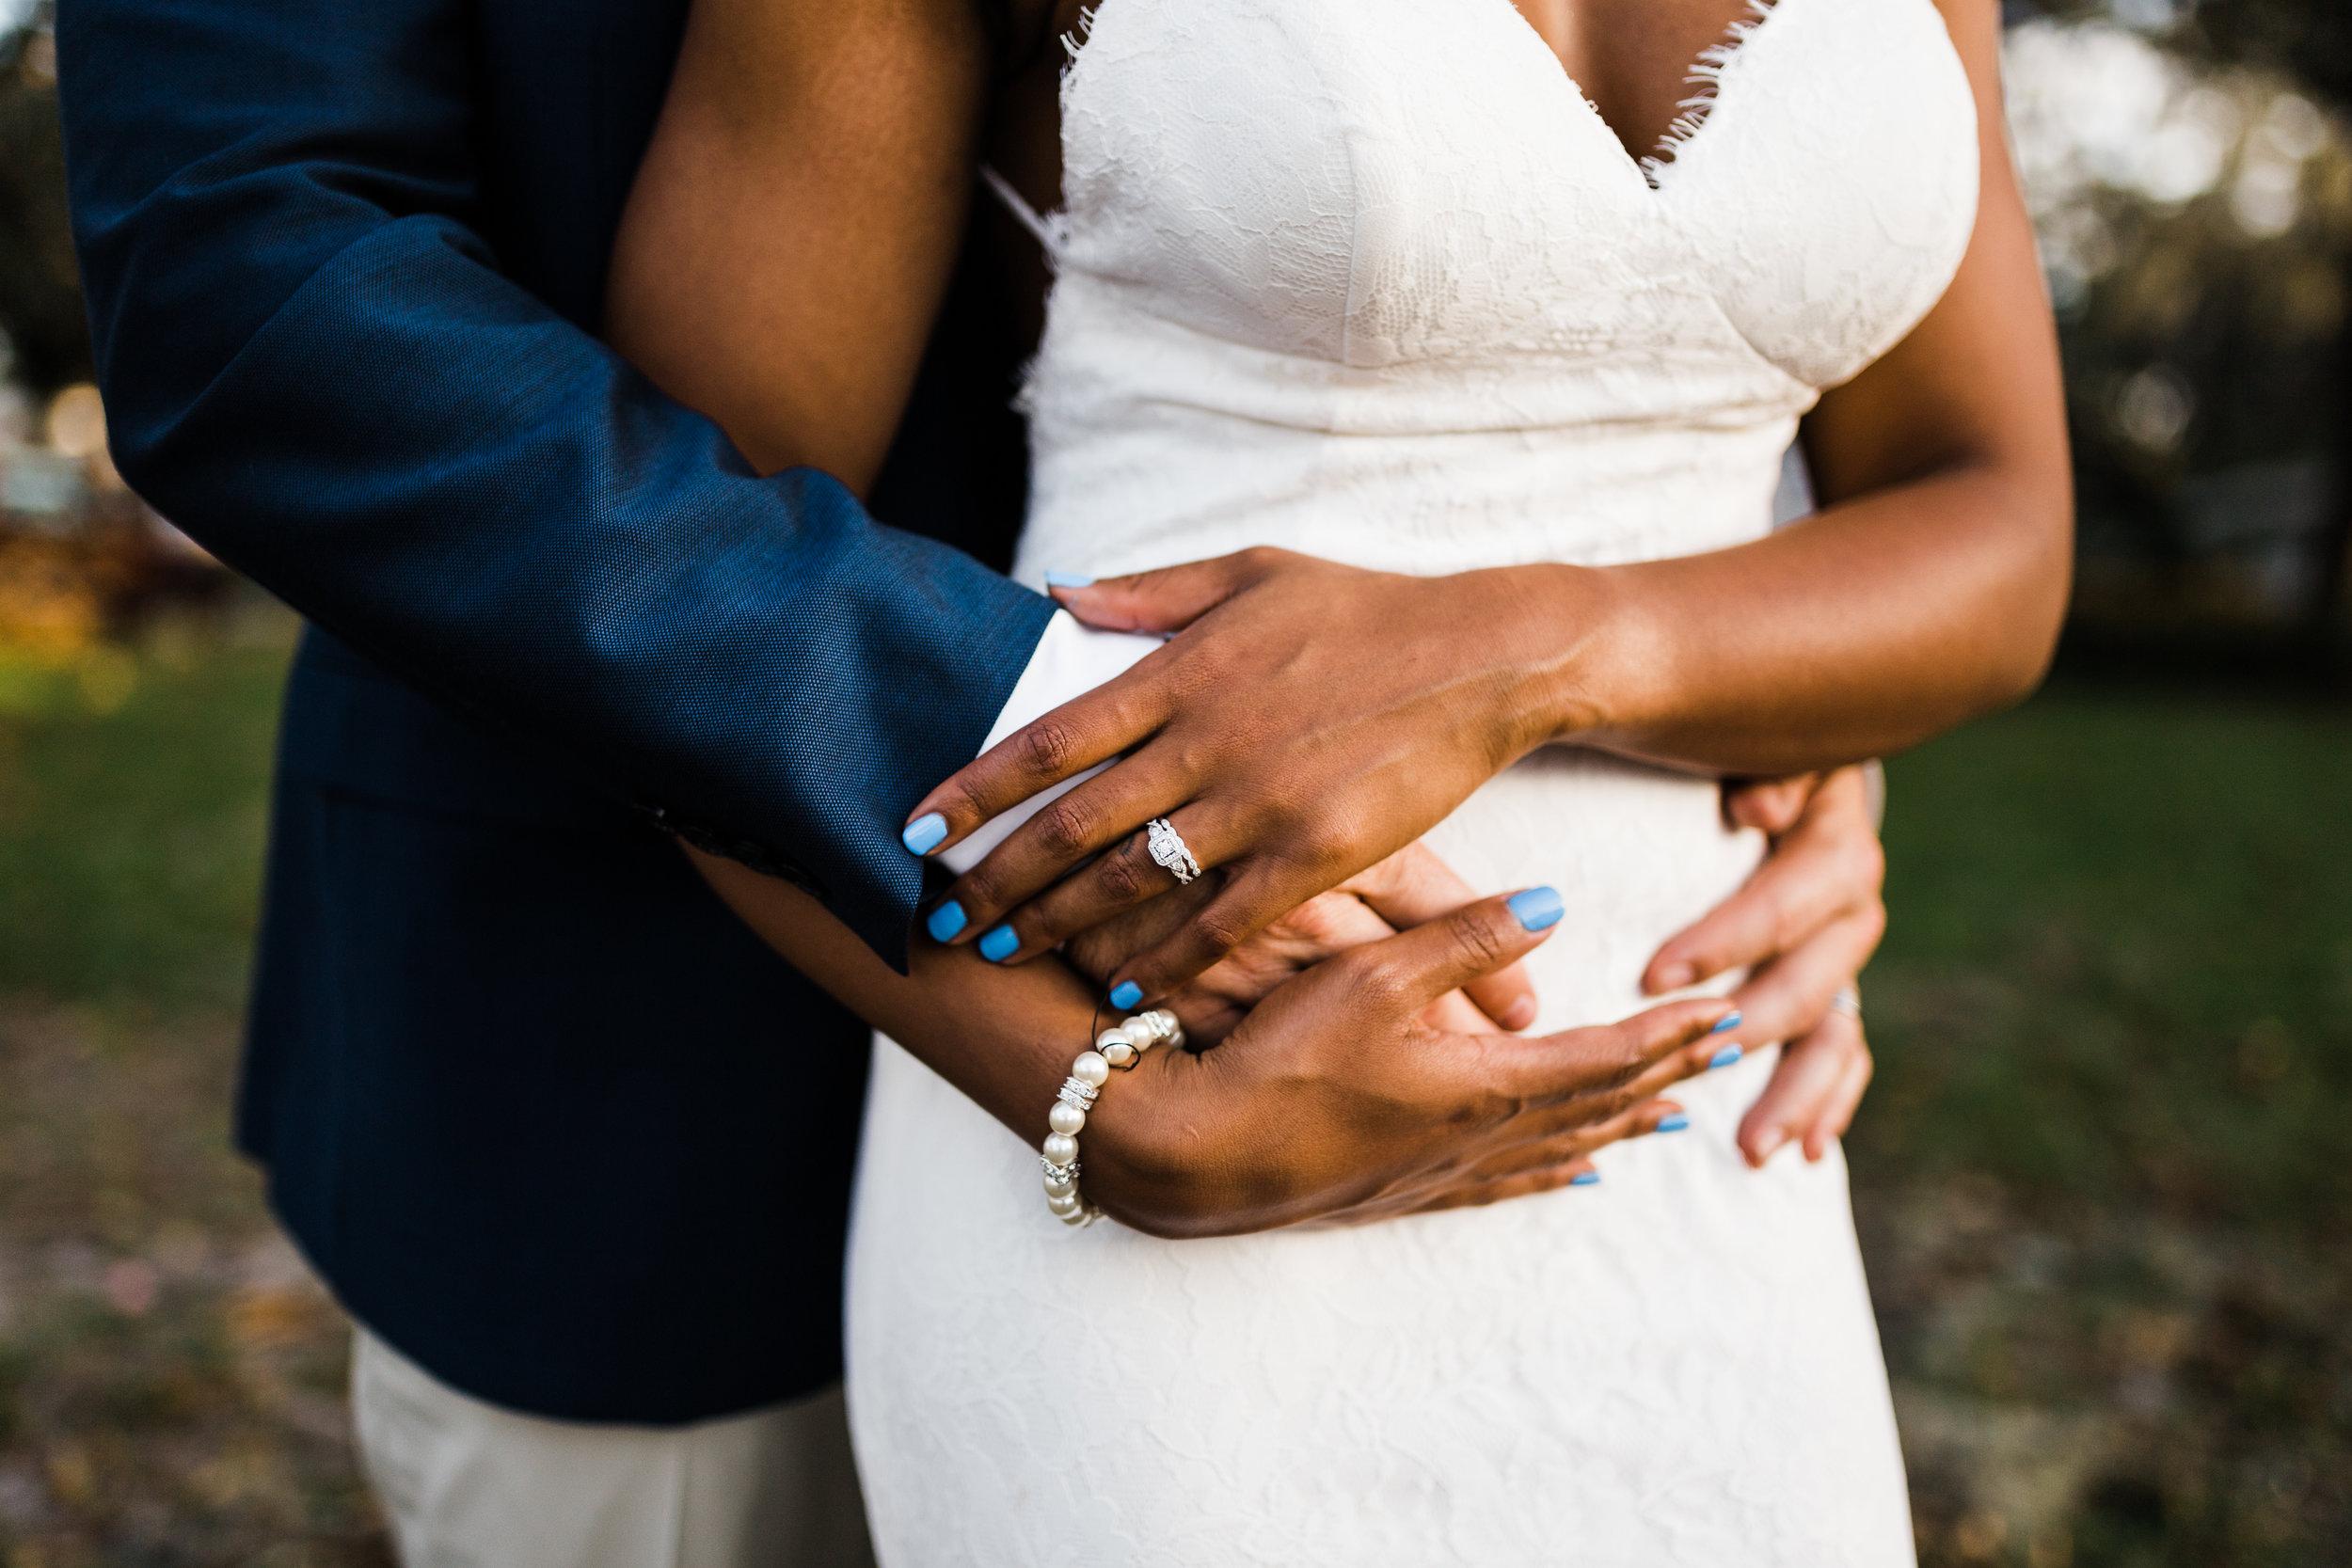 2017.09.16 Ashley and Chuck O'Day Quantam Leap Winery Wedding (398 of 462).jpg